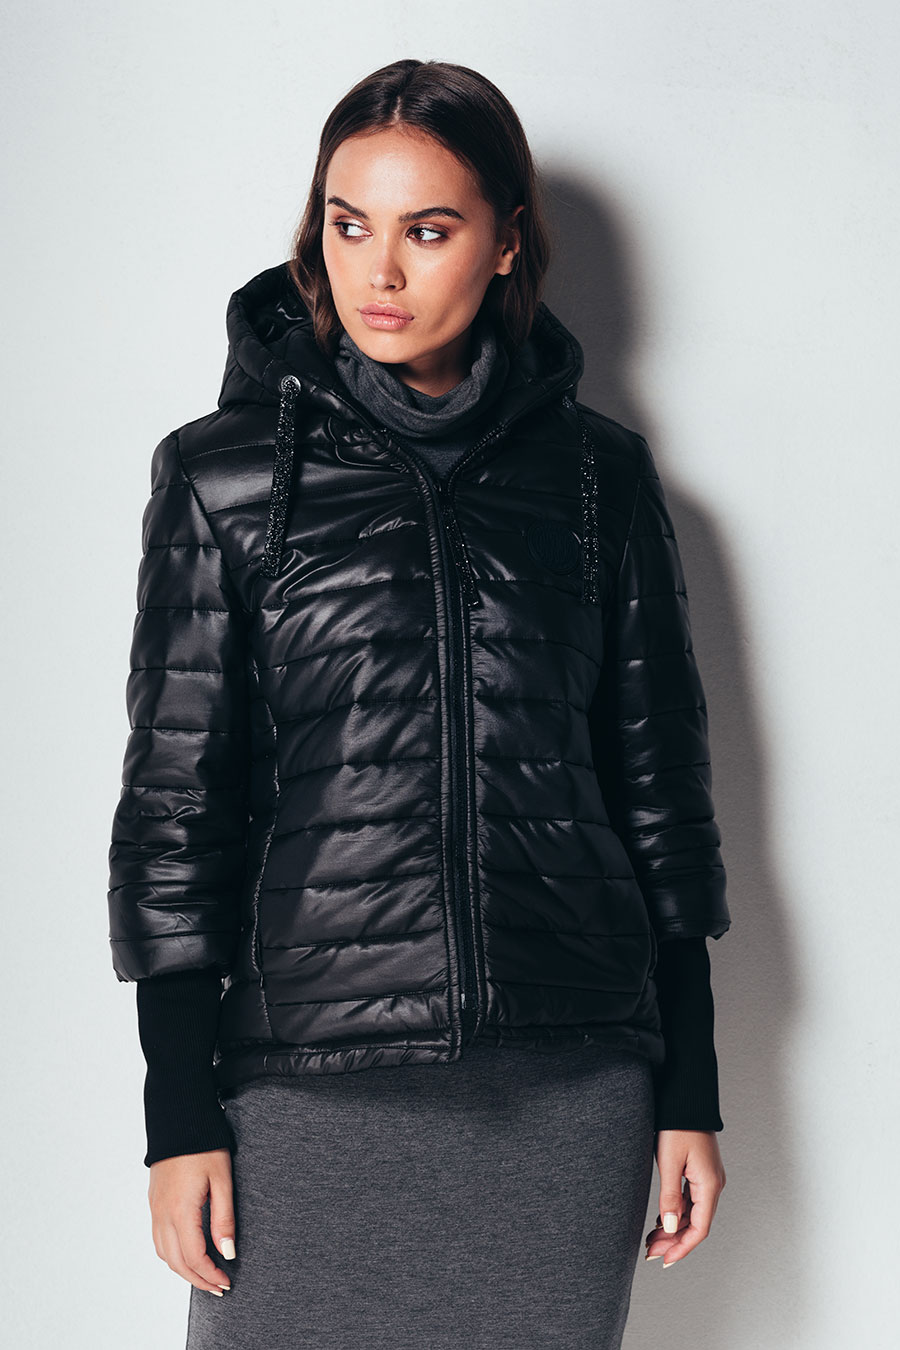 jagger internet prodavnica kolekcija jesen zima 2021 zenska jakna jg 6232 01 5